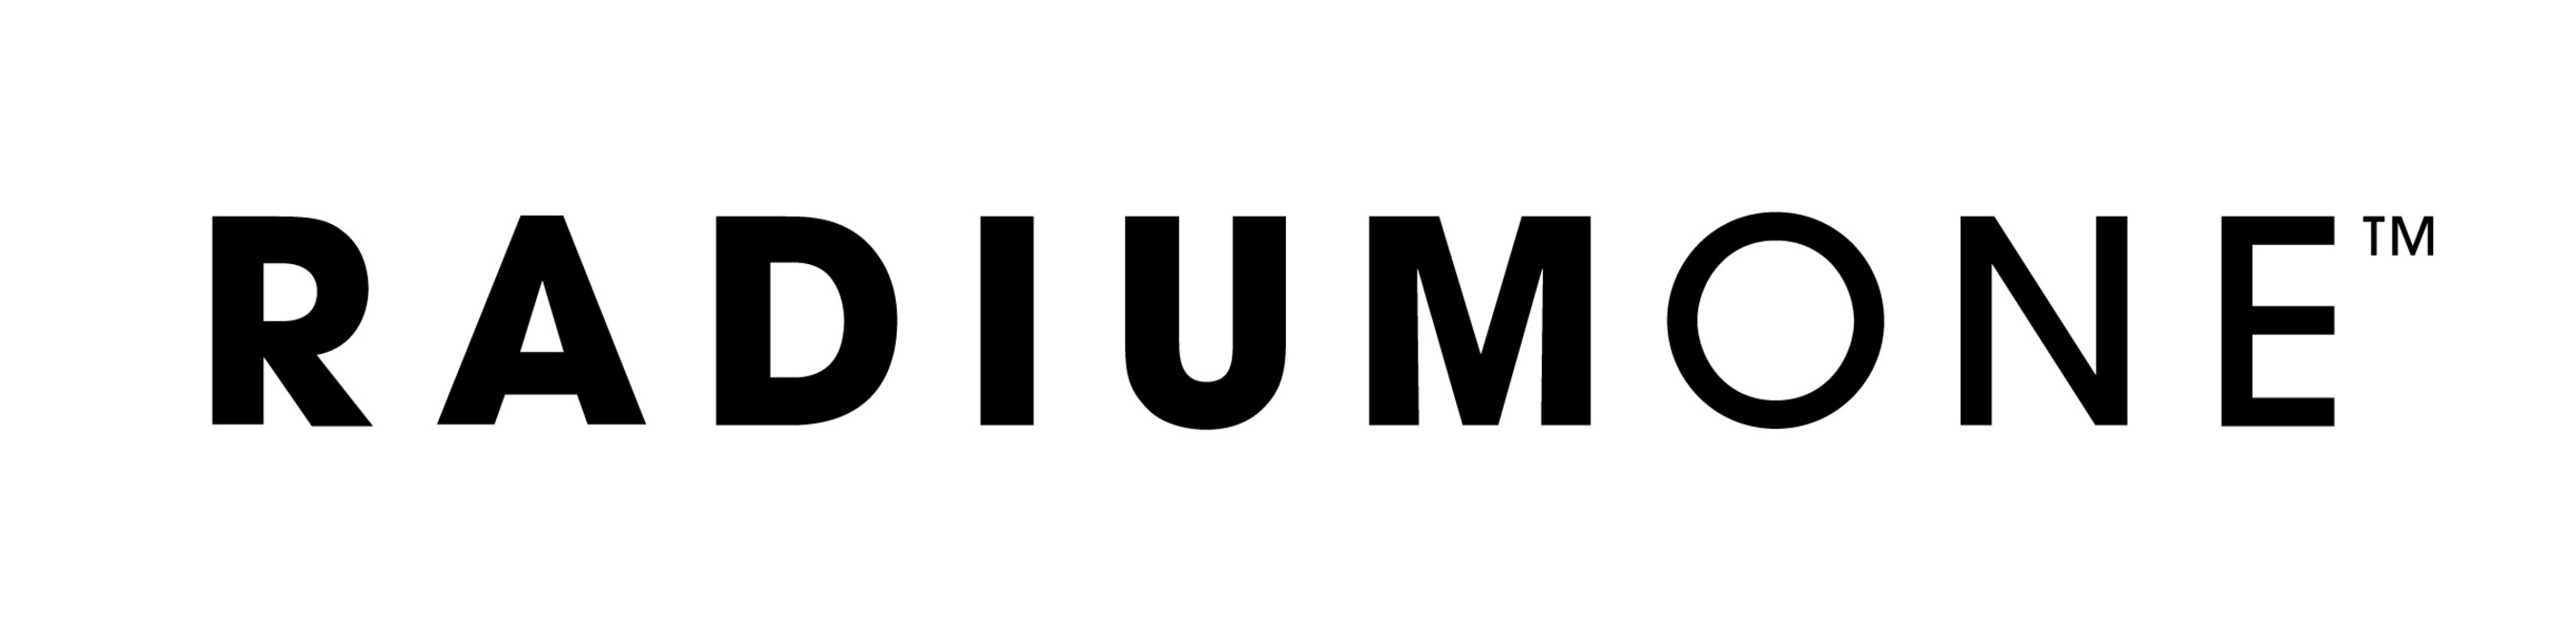 RadiumOne Unveils Partner Ecosystem to Help Marketers Unlock and Activate Customer Data